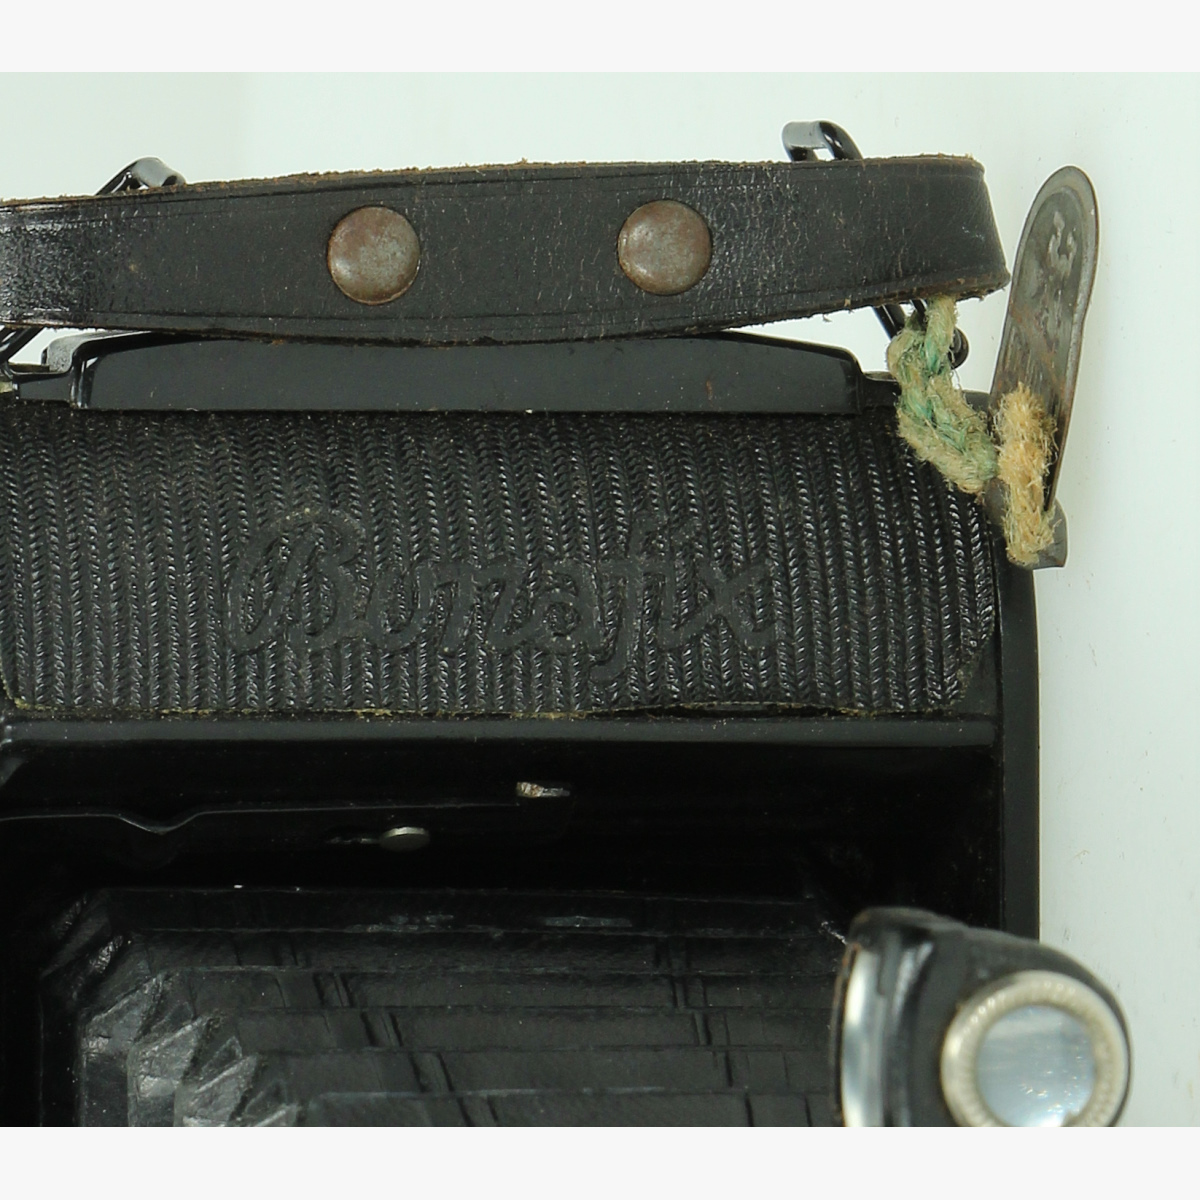 Afbeeldingen van fotocamera bomafix rodenstock trinar vario